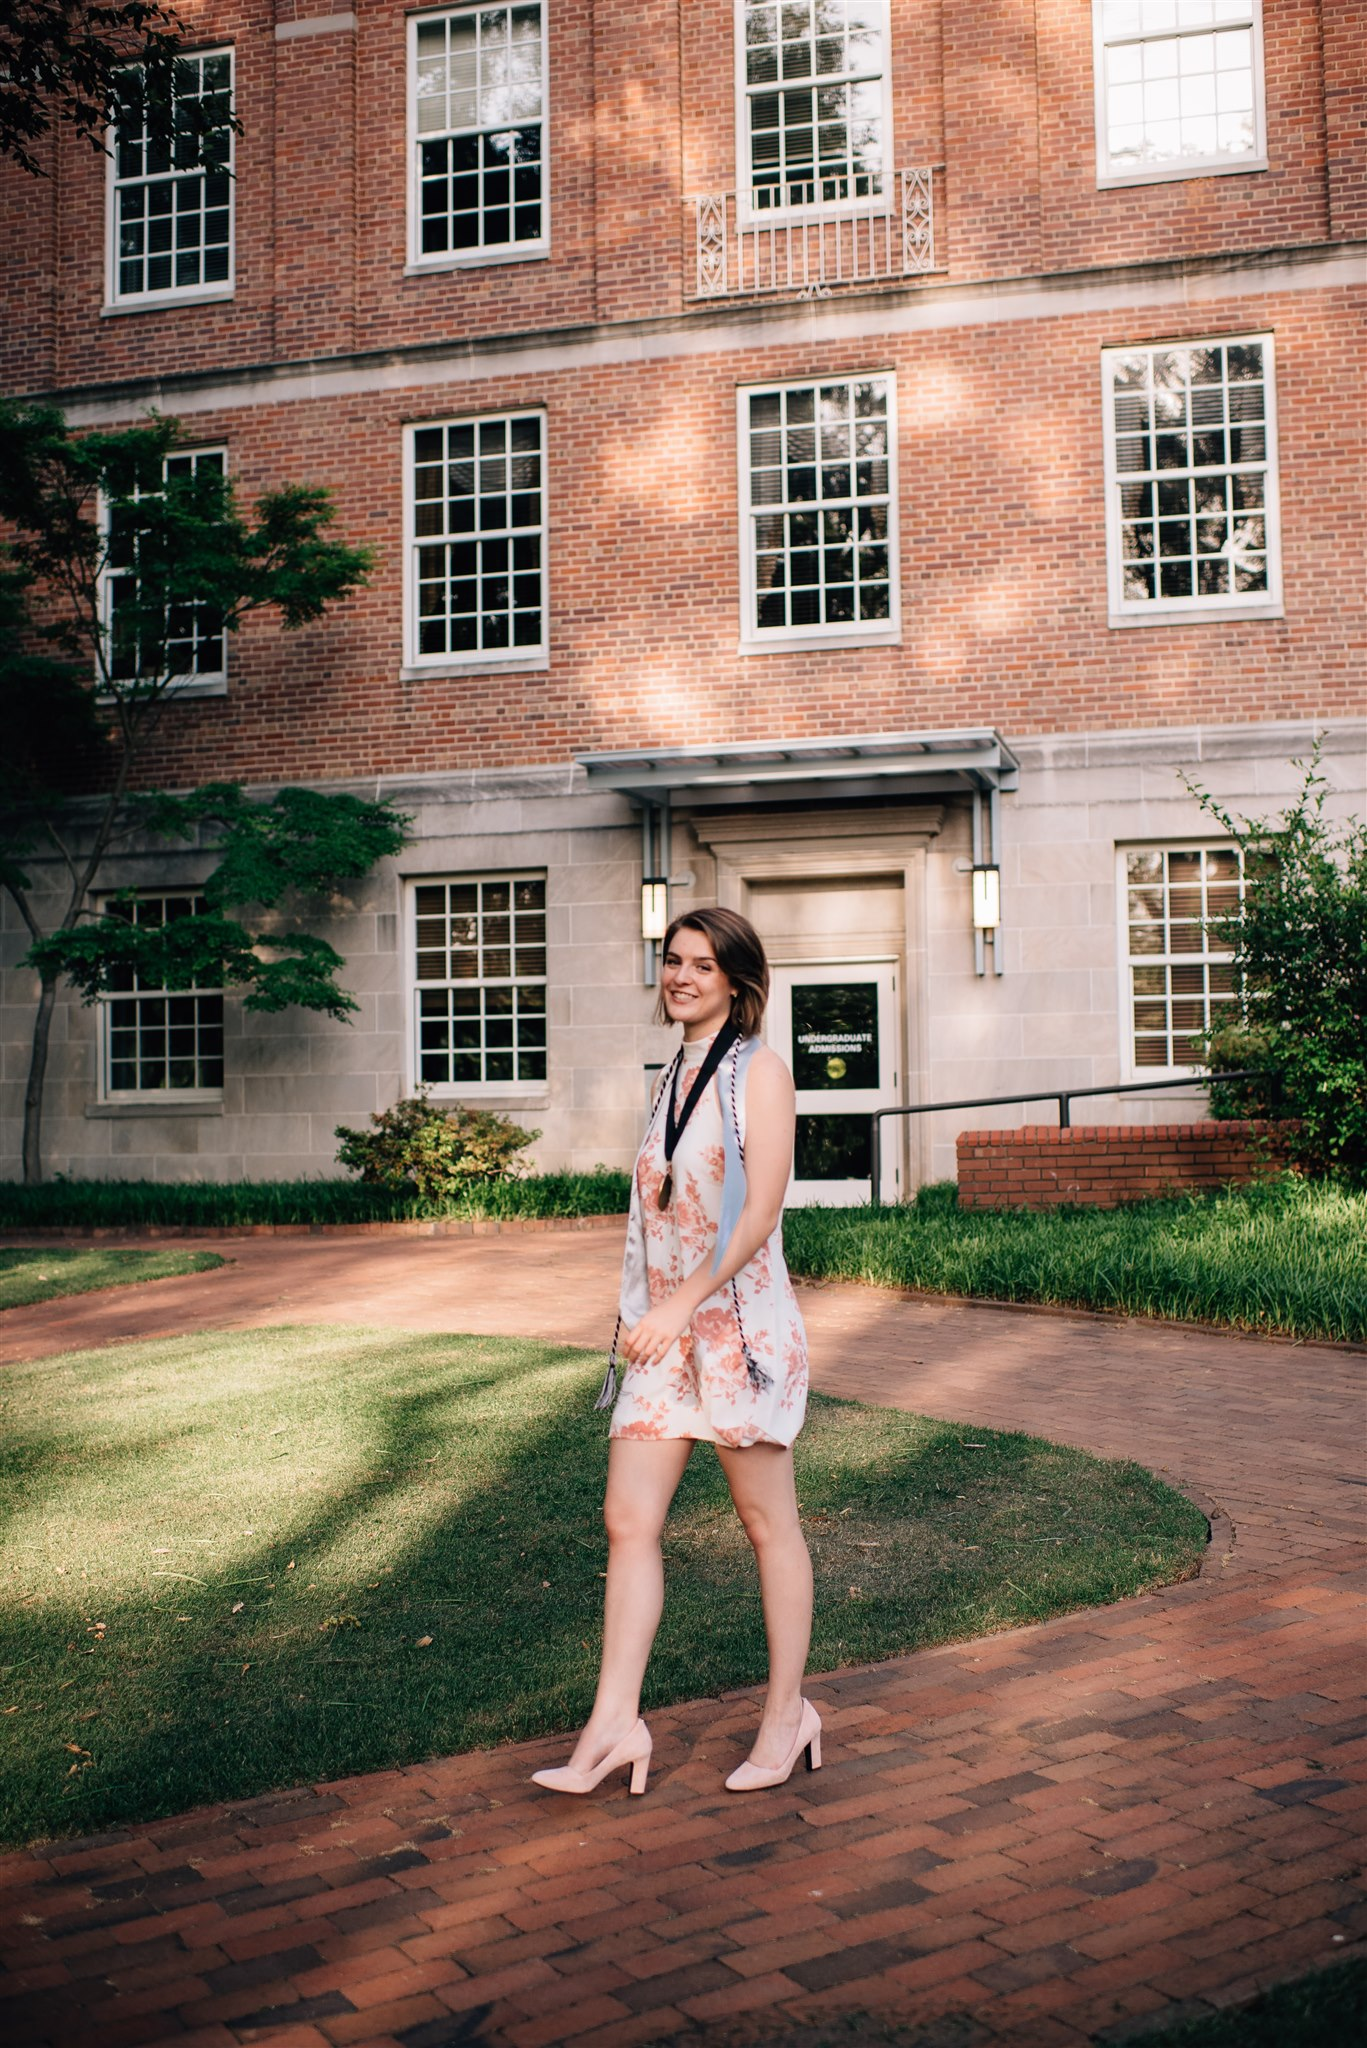 NC State Graduation Photographer - NC State Graduation Session - Raleigh Senior Photographer - North Carolina Senior Photographer